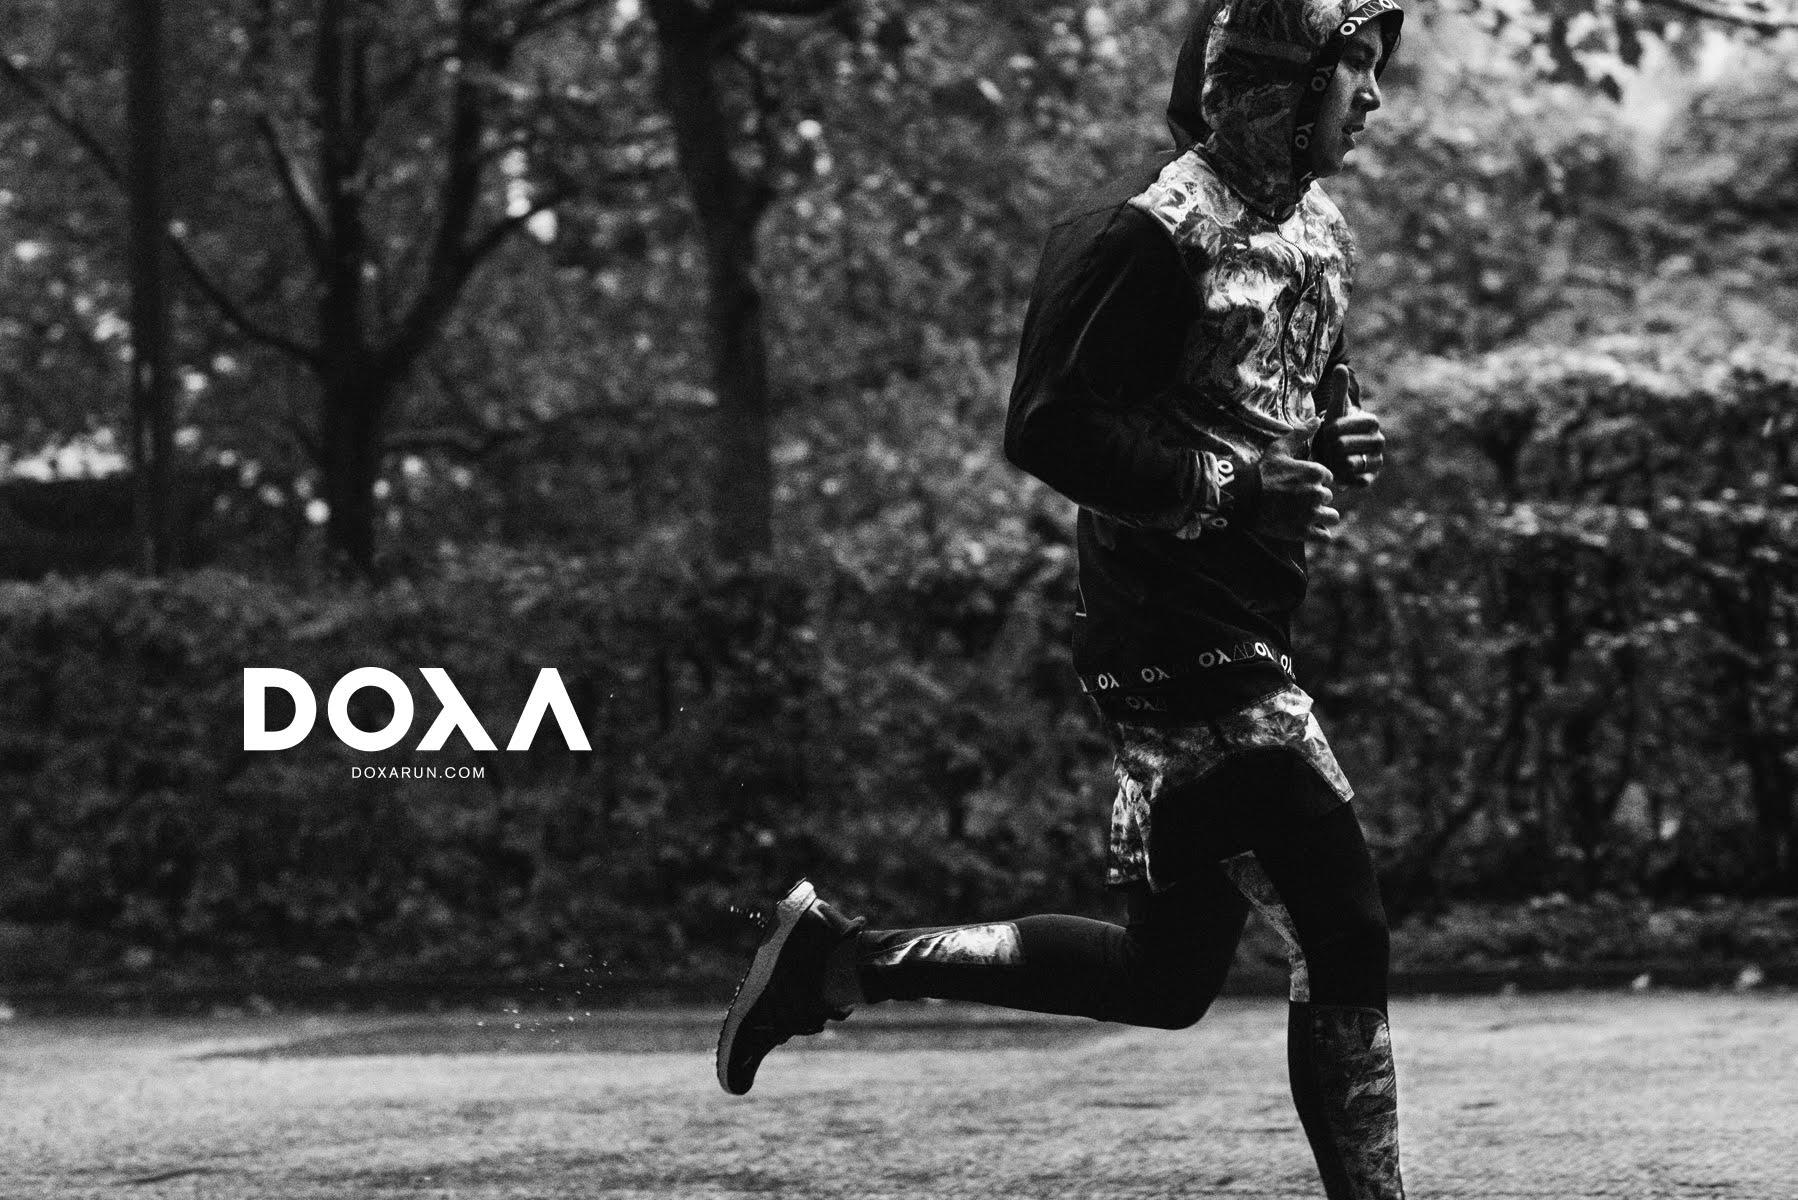 DOXA, novi brend trkačke opreme iz Kopenhagena [Kickstarter]